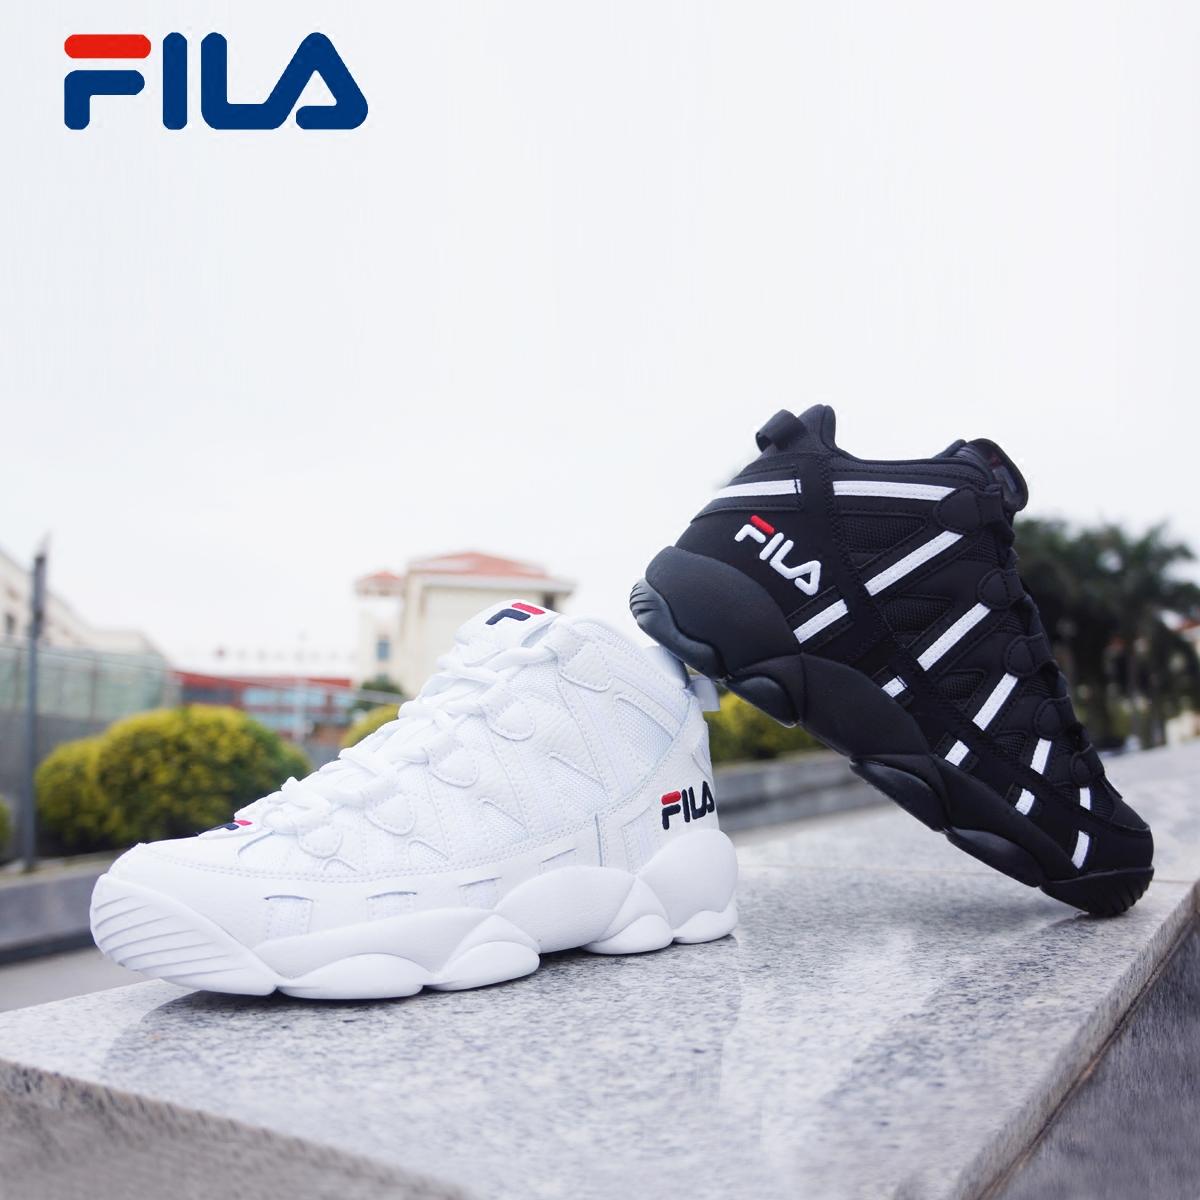 fila women 2018 for sale a5a5f c6232